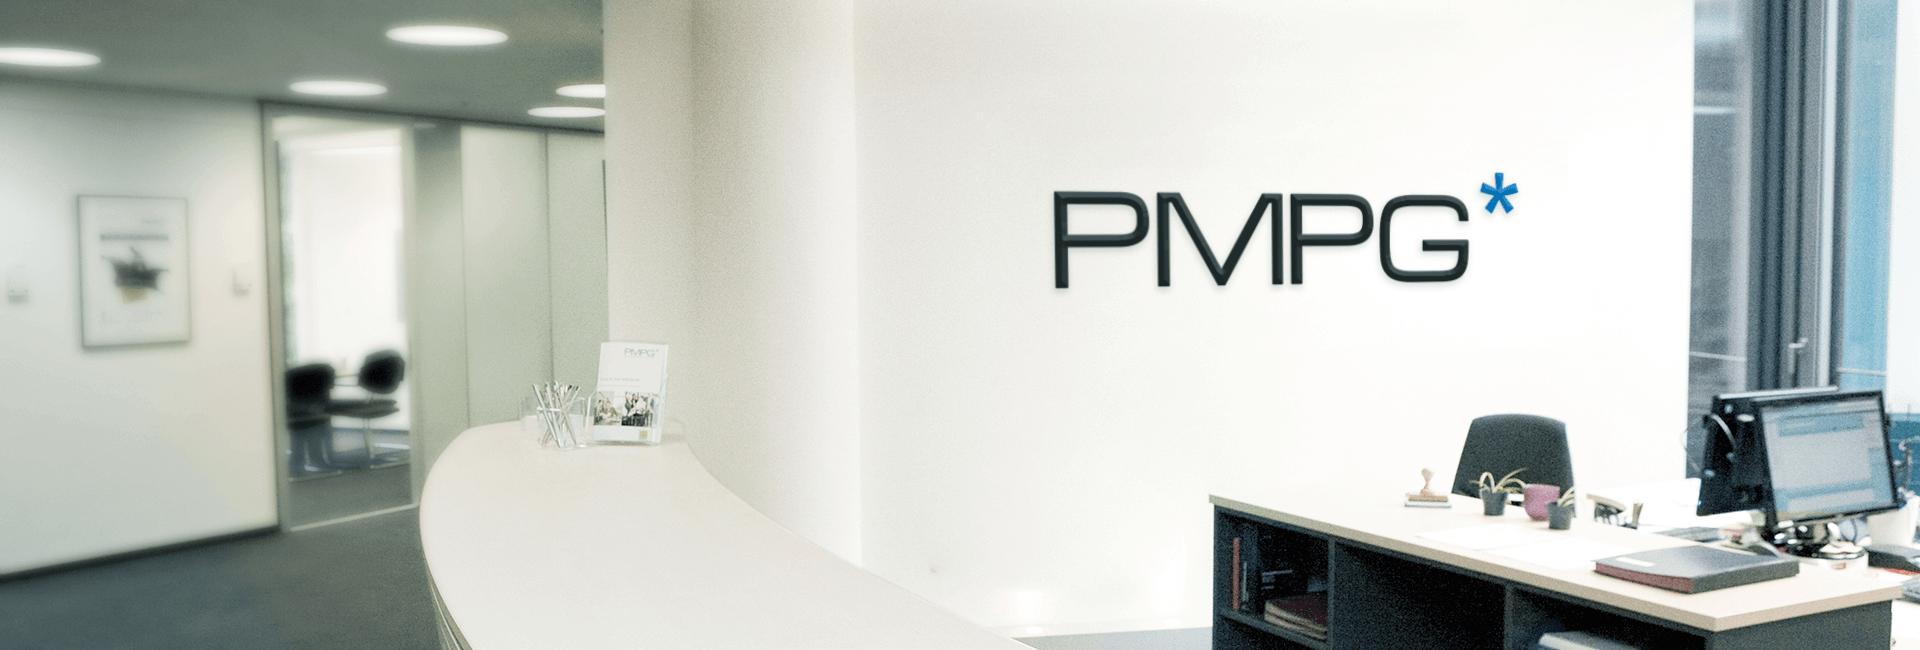 Willkommen bei der PMPG Rechtsberatung